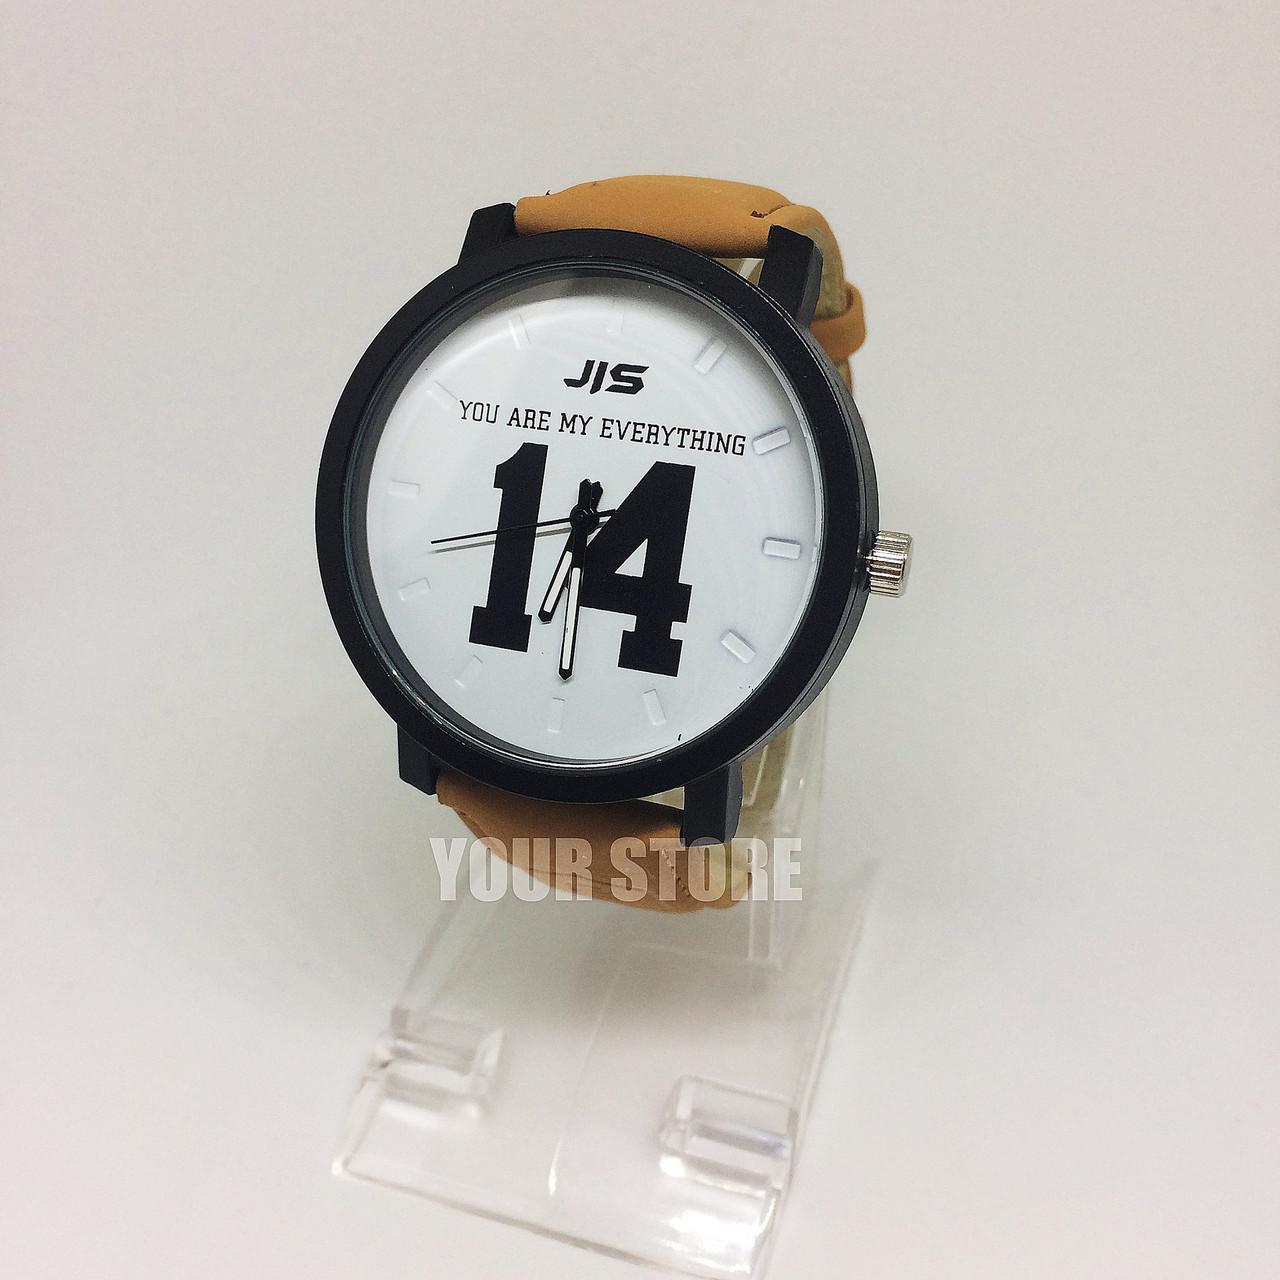 Мужские часы с цифрами 14